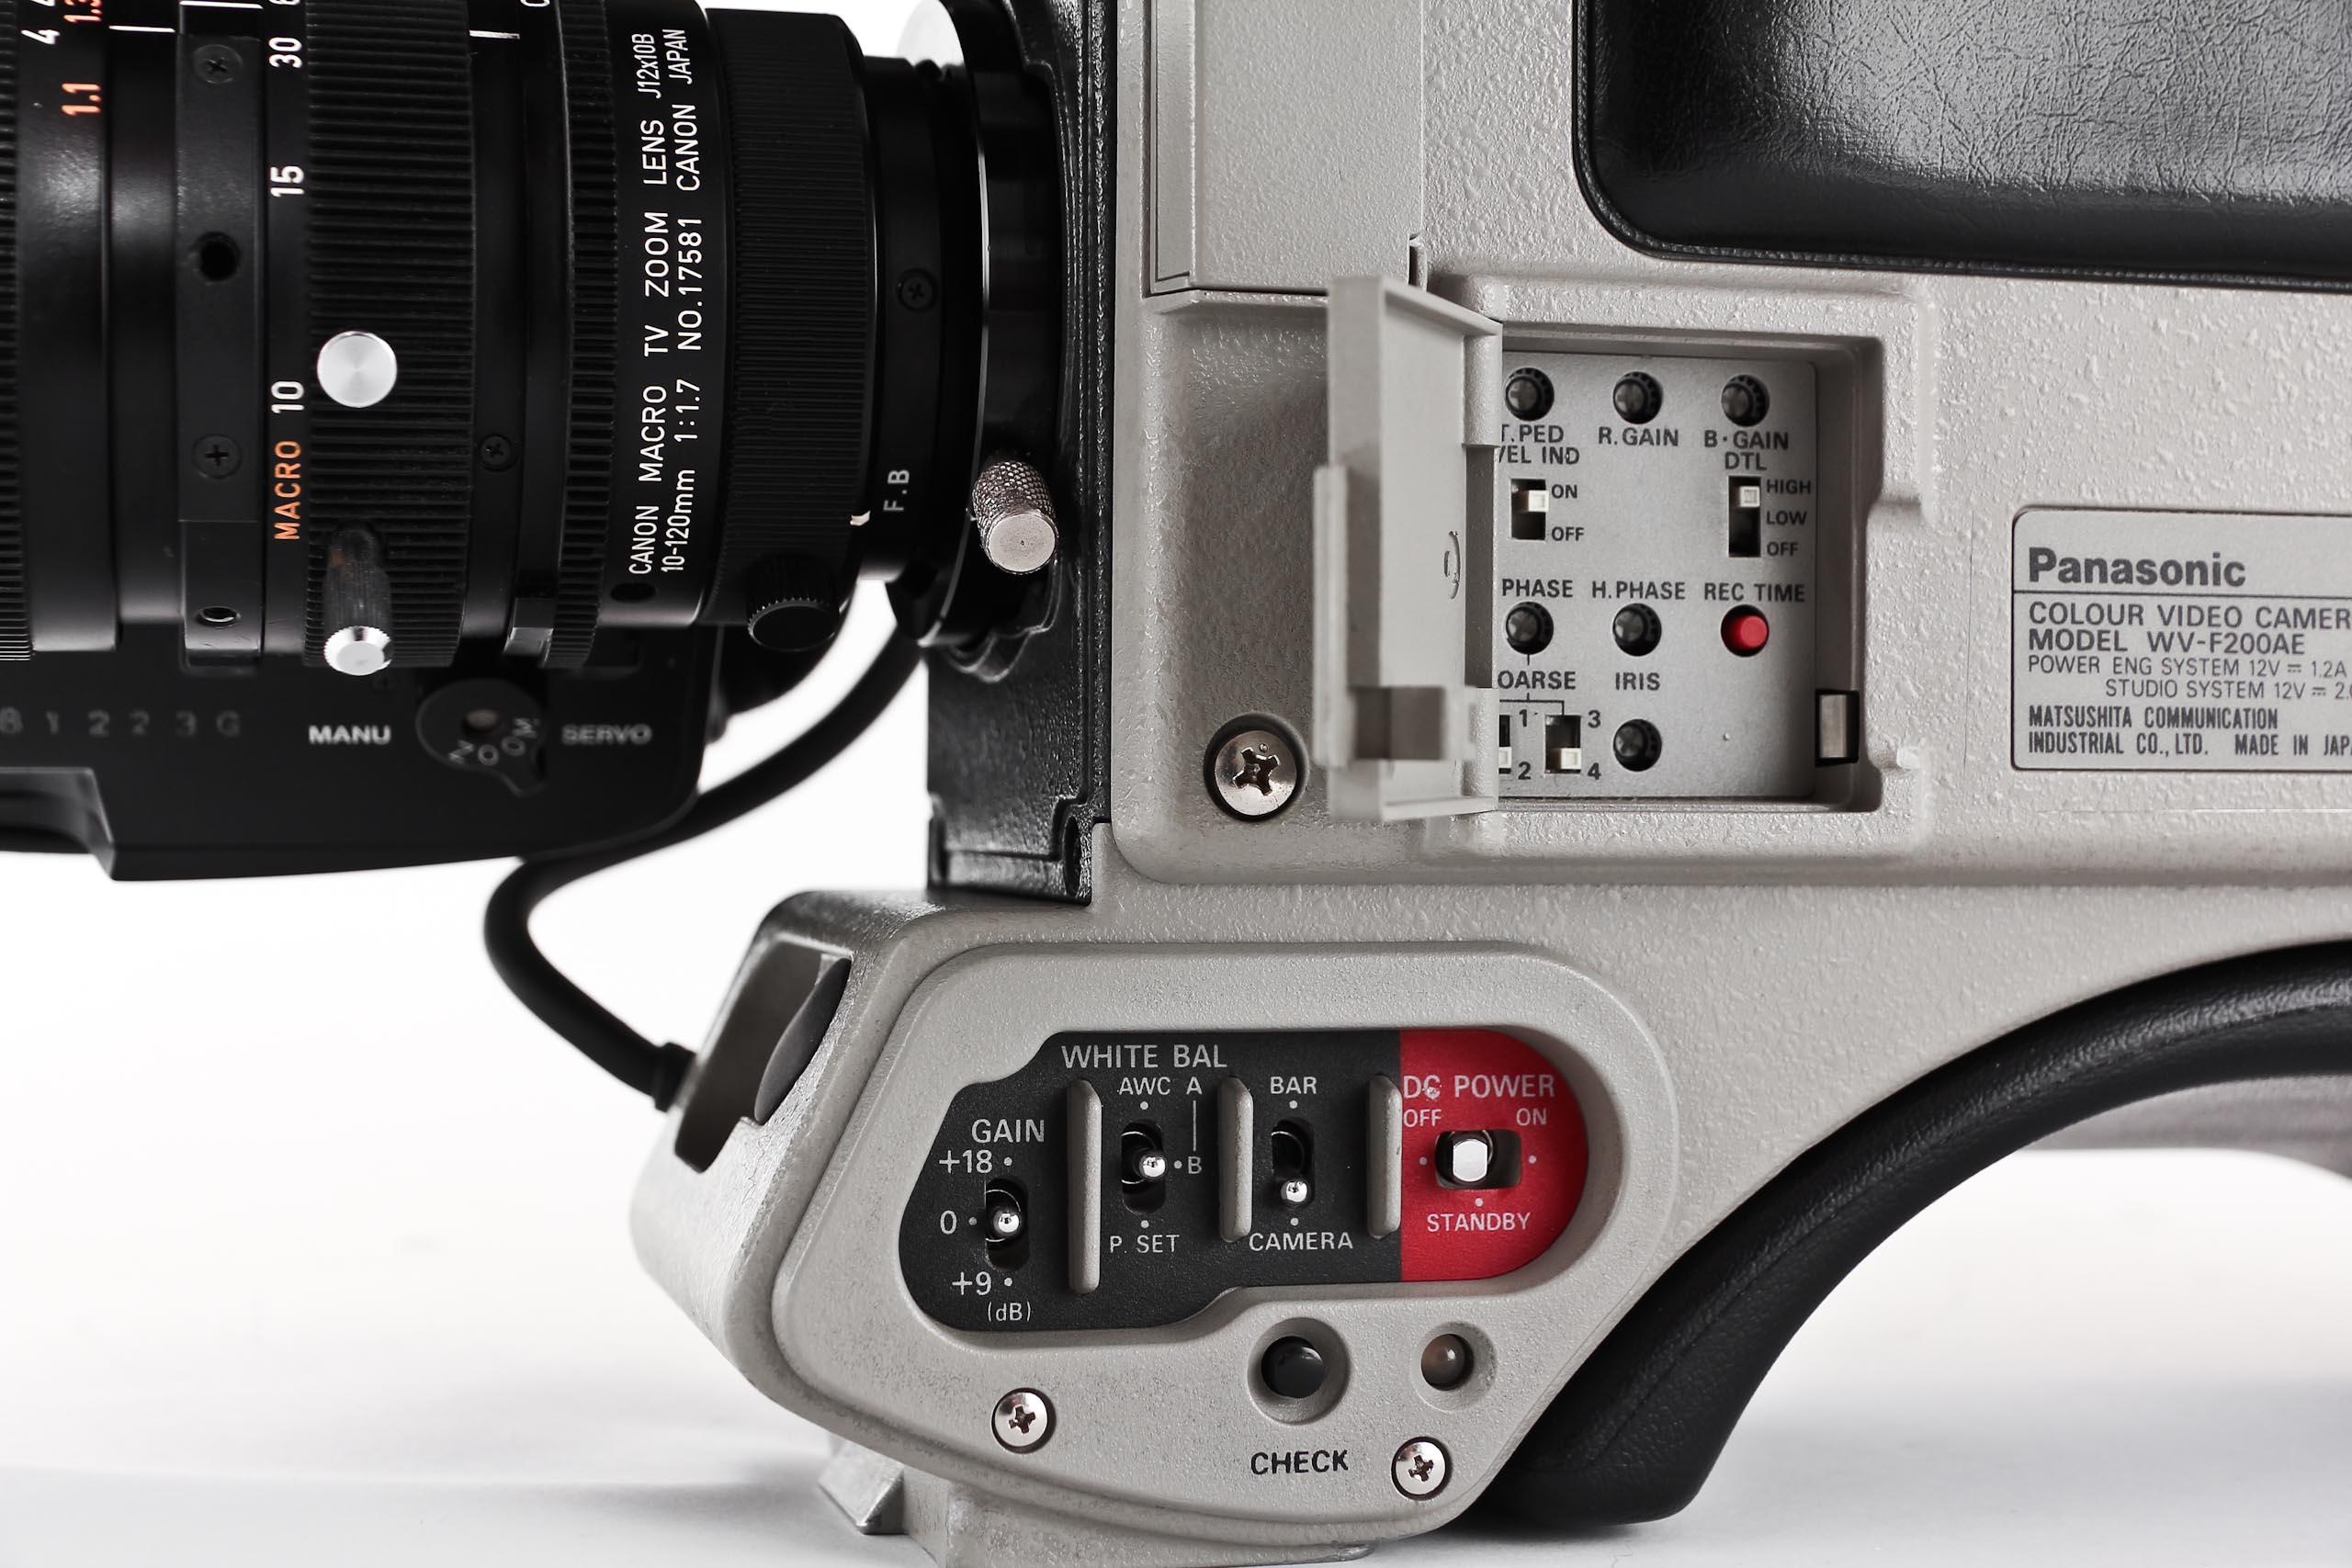 Panasonic WV-F200A - 4